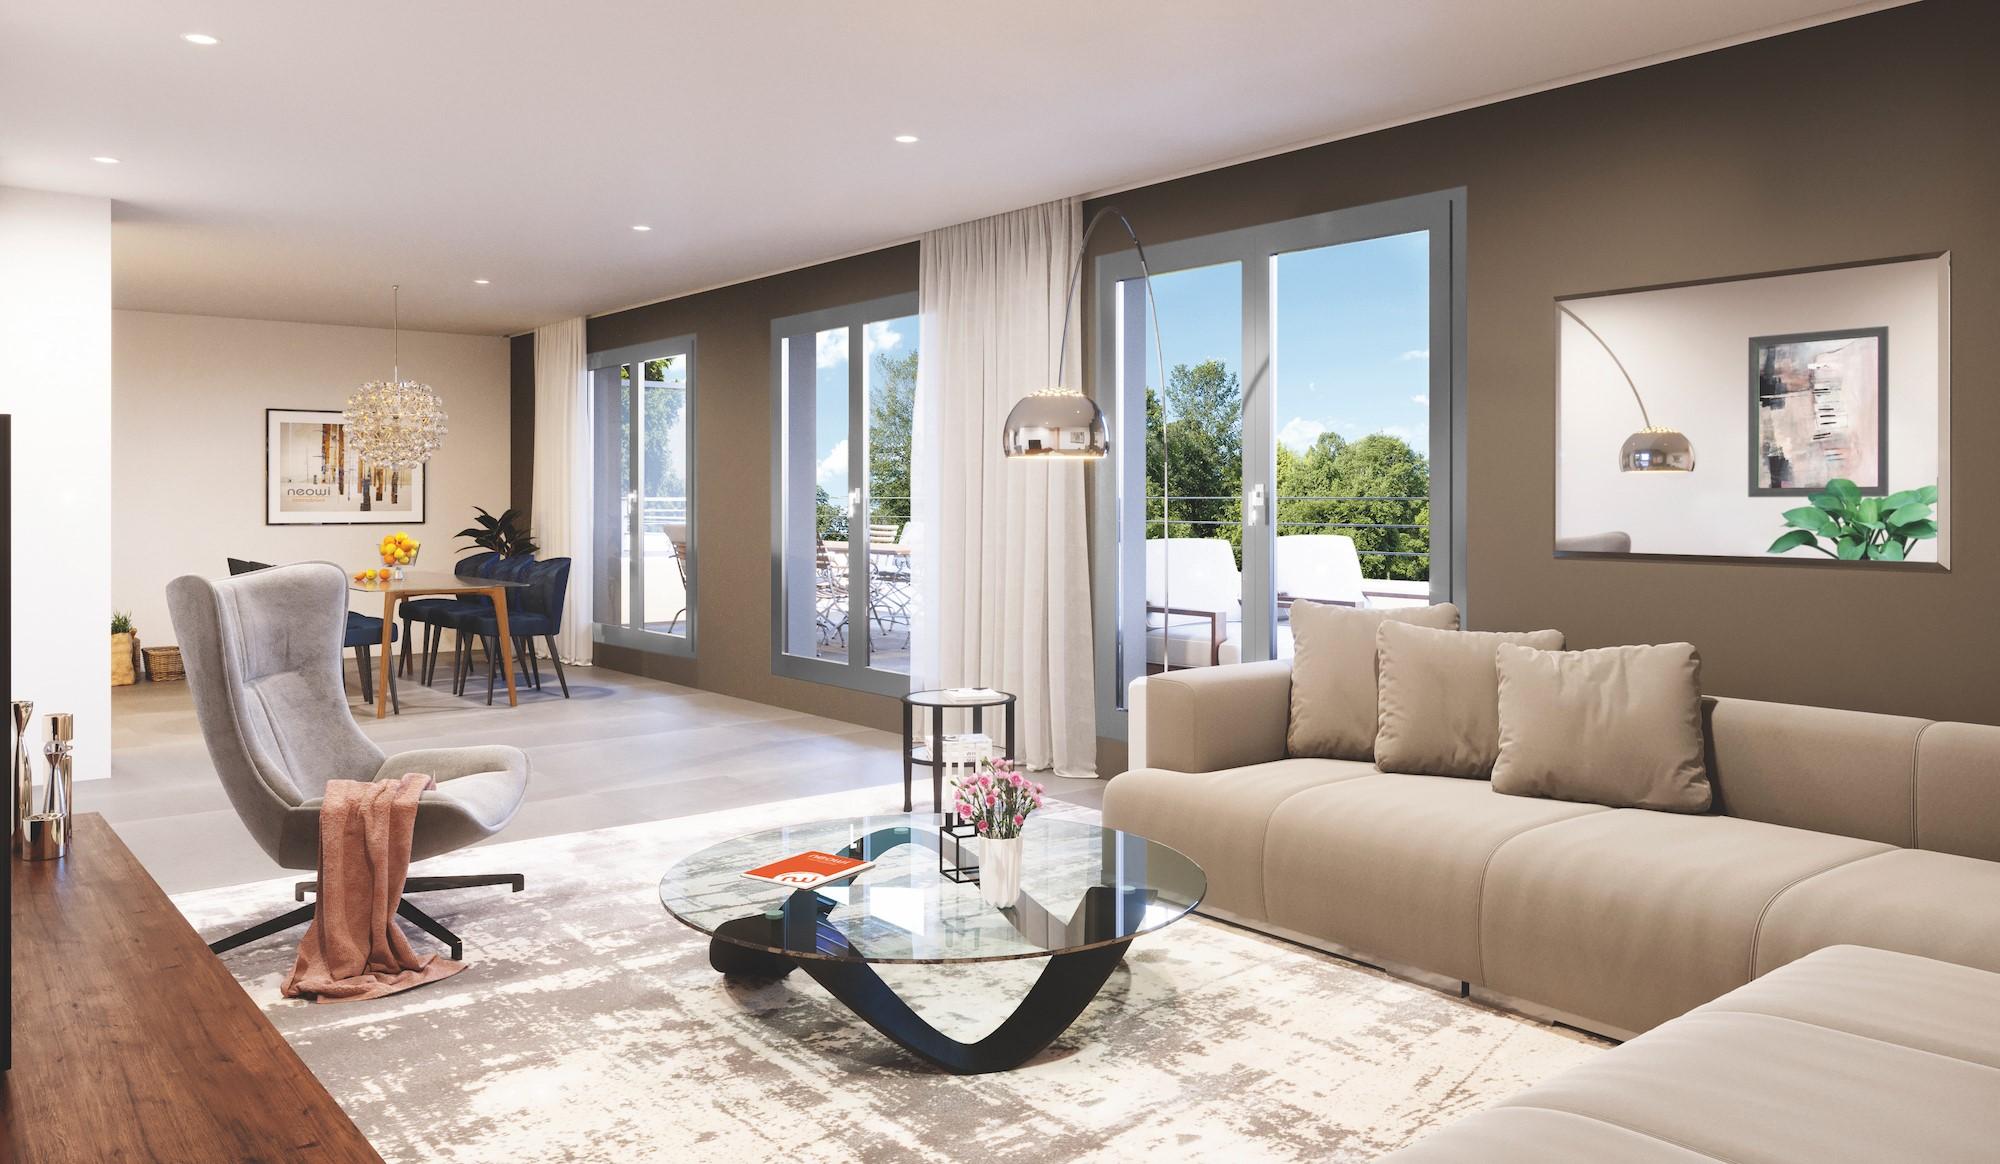 Programme immobilier Grigny (69520) Centre Ville AST1